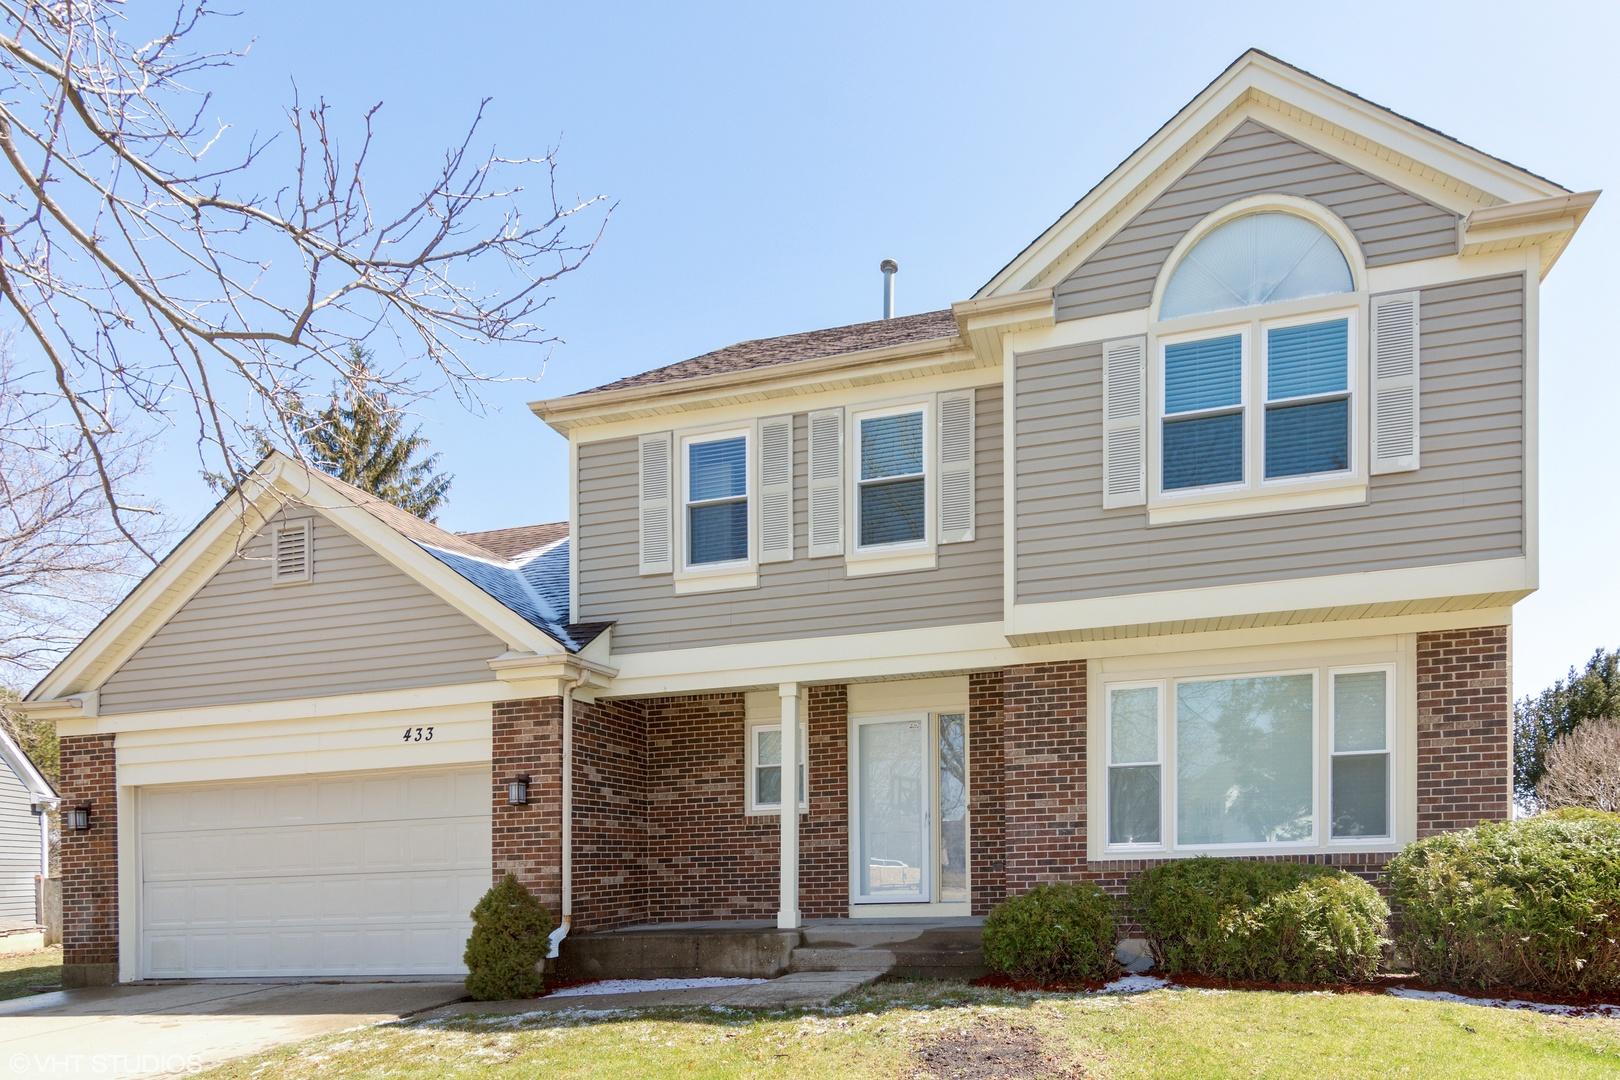 433 CEDAR Court South, Buffalo Grove in Lake County, IL 60089 Home for Sale